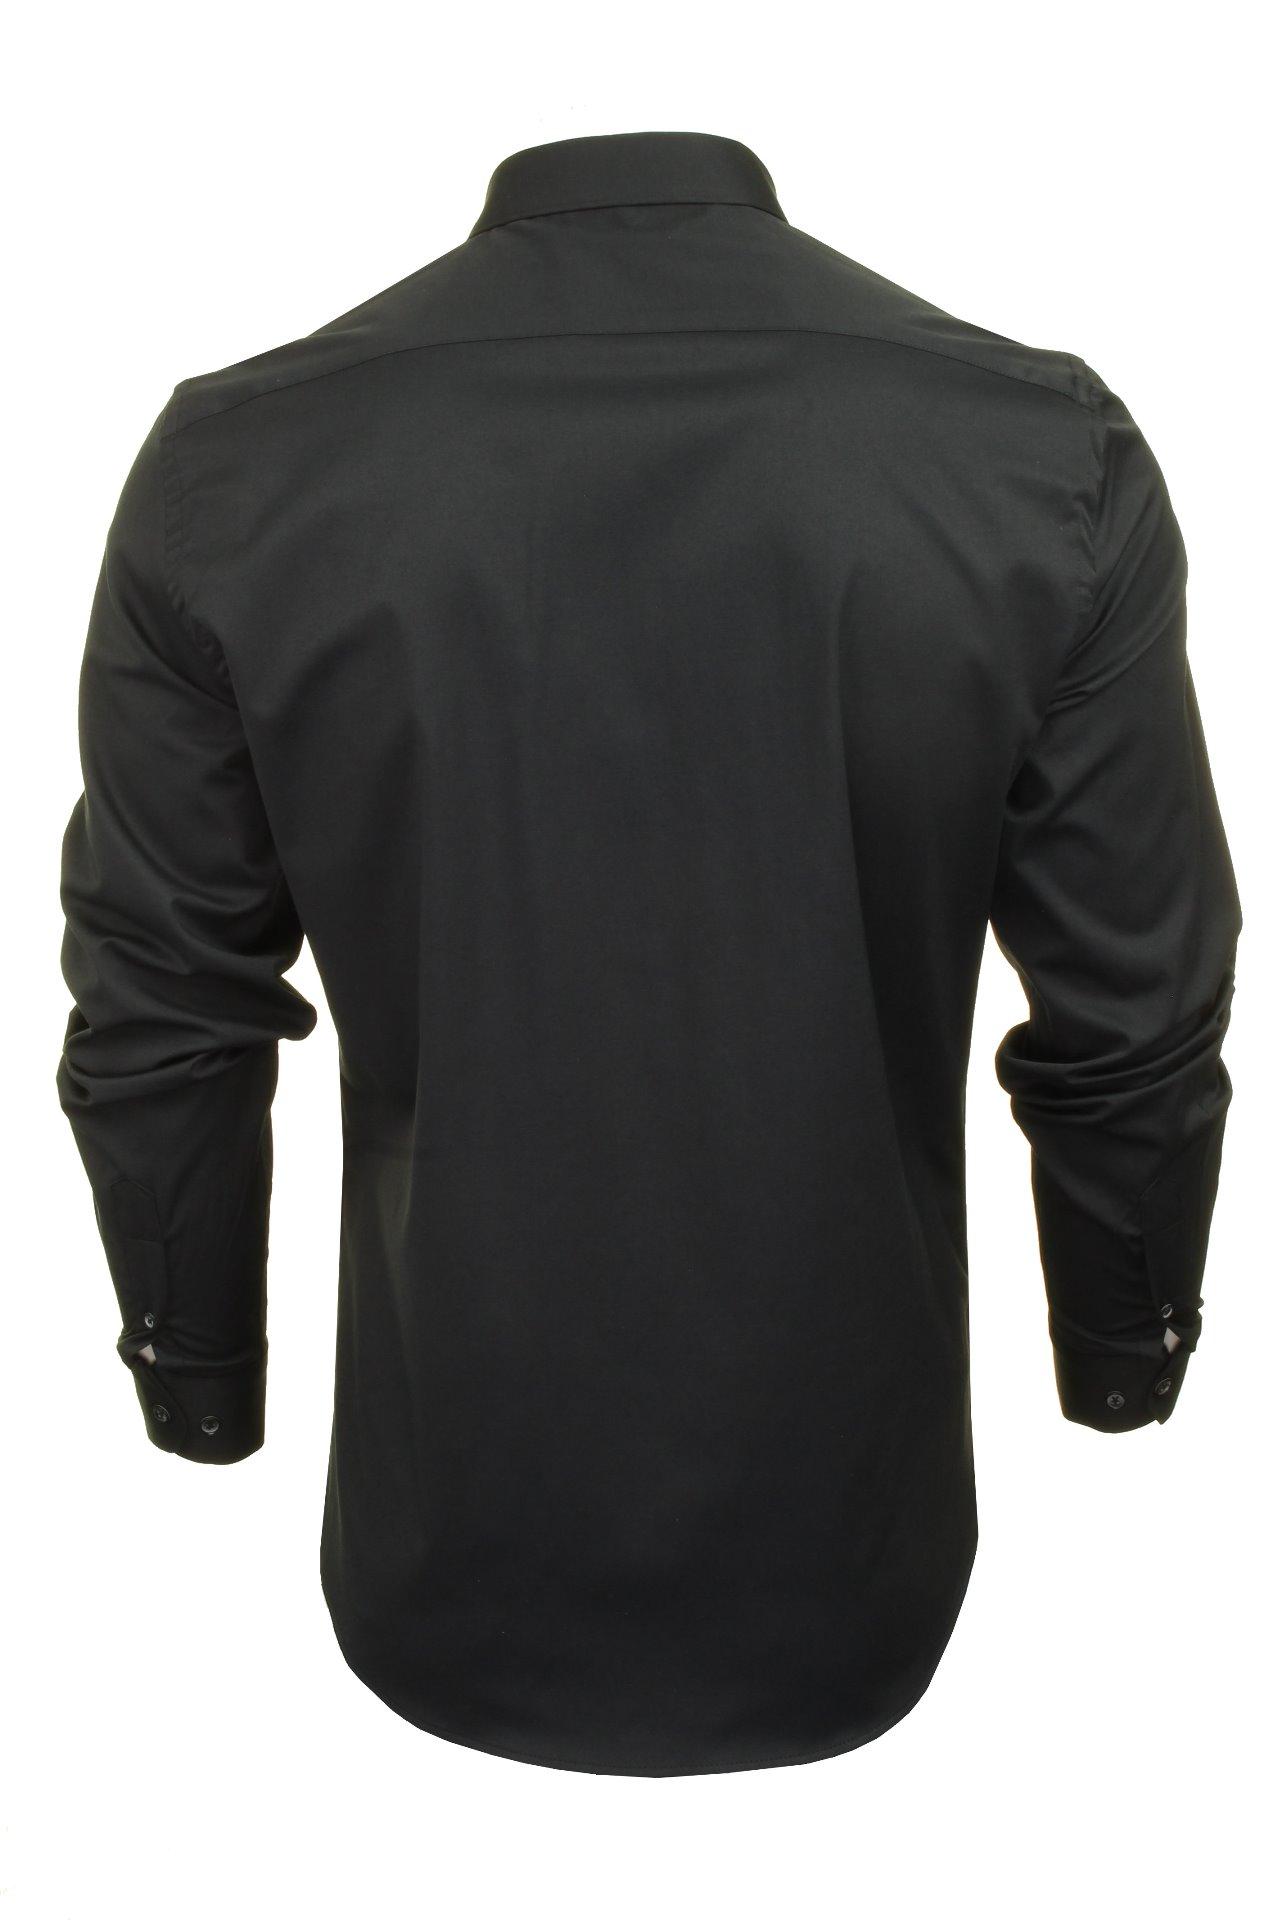 Xact-Mens-Long-Sleeved-Poplin-Stretch-Shirt-Slim-Fit miniatuur 6